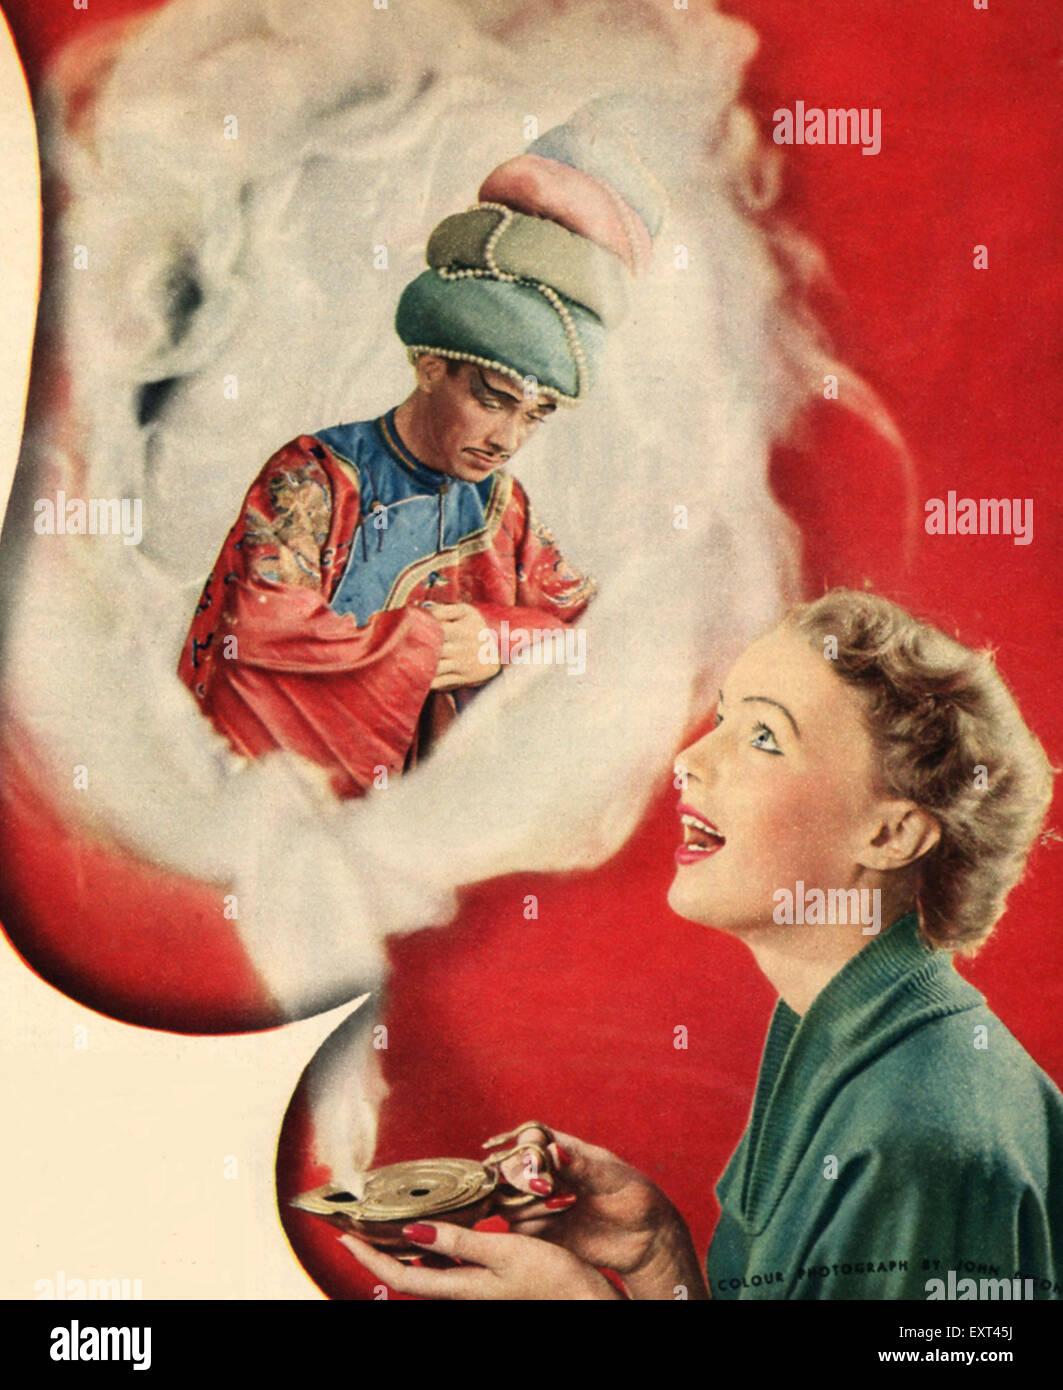 1950s UK Genie and wishes Magazine Plate - Stock Image